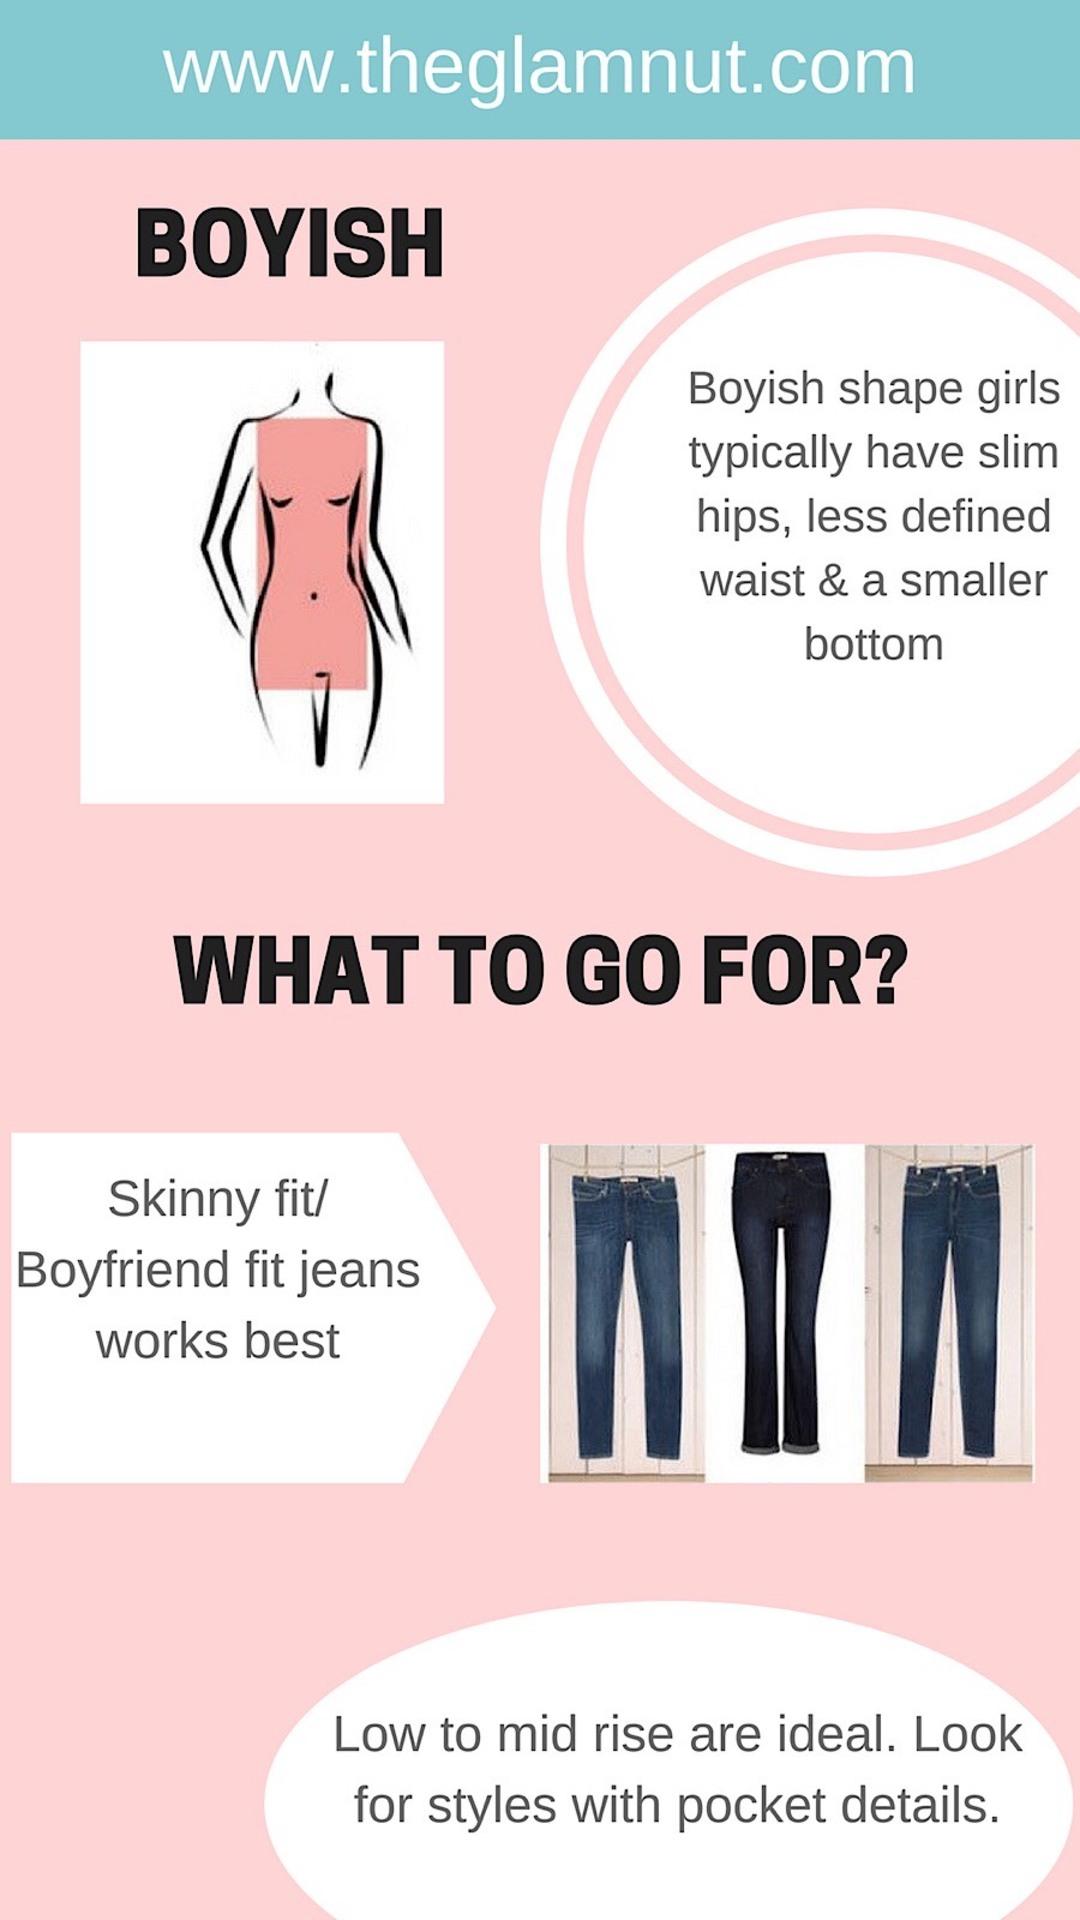 THE GLAM NUT - Fashion & Lifestyle Blog - 9222D6DF-84E7-4ACF-99A7-C97E505FD1BE